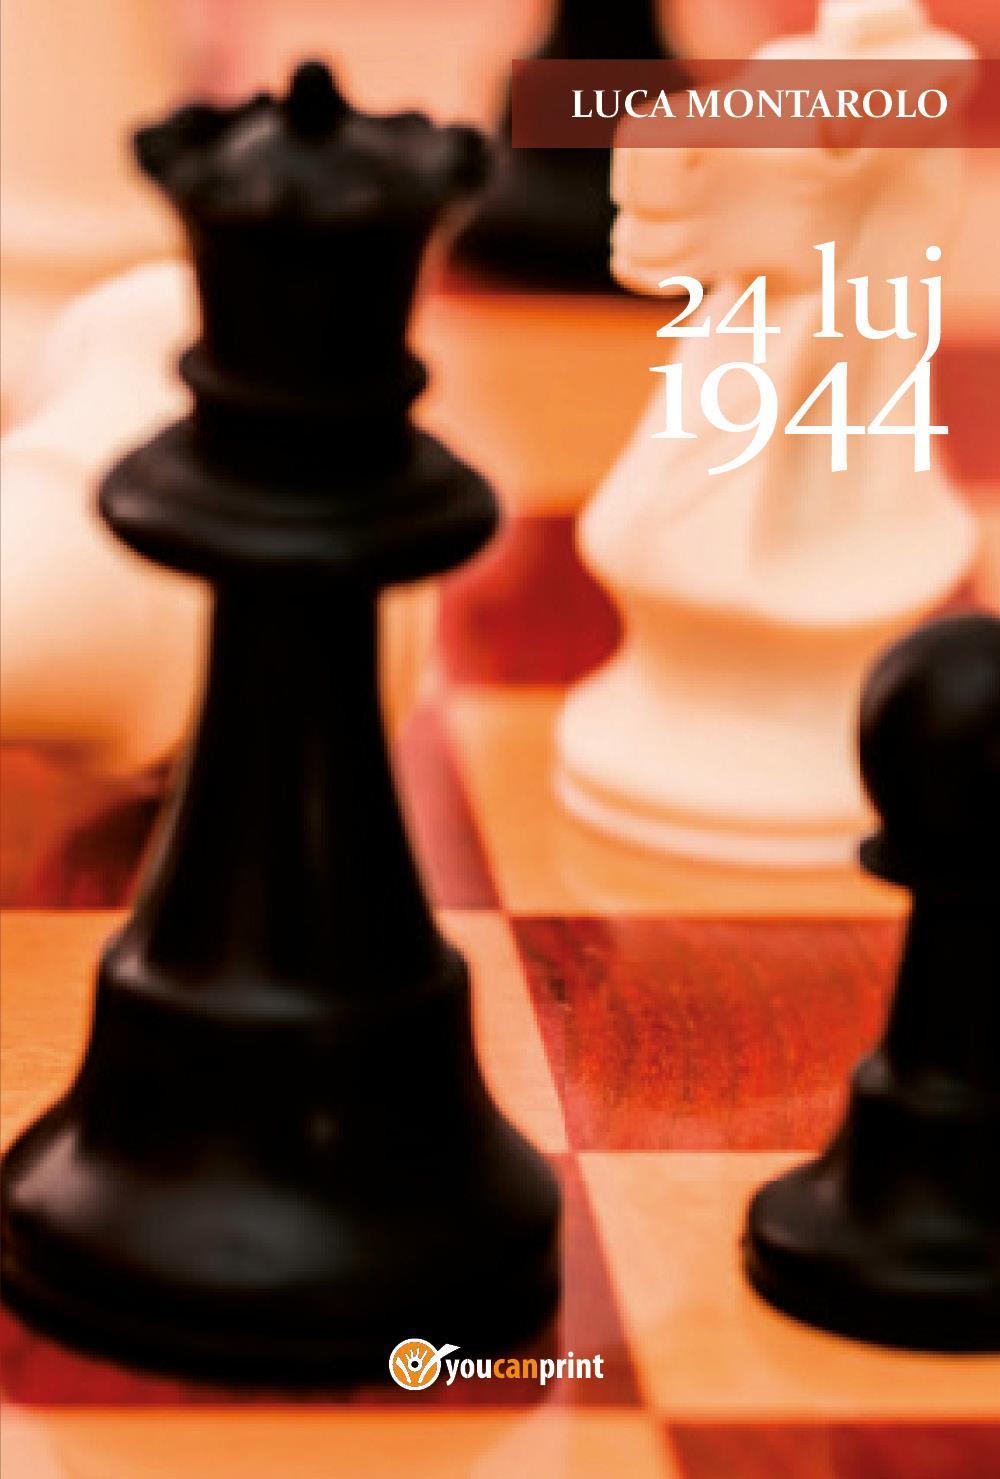 24 luj 1944